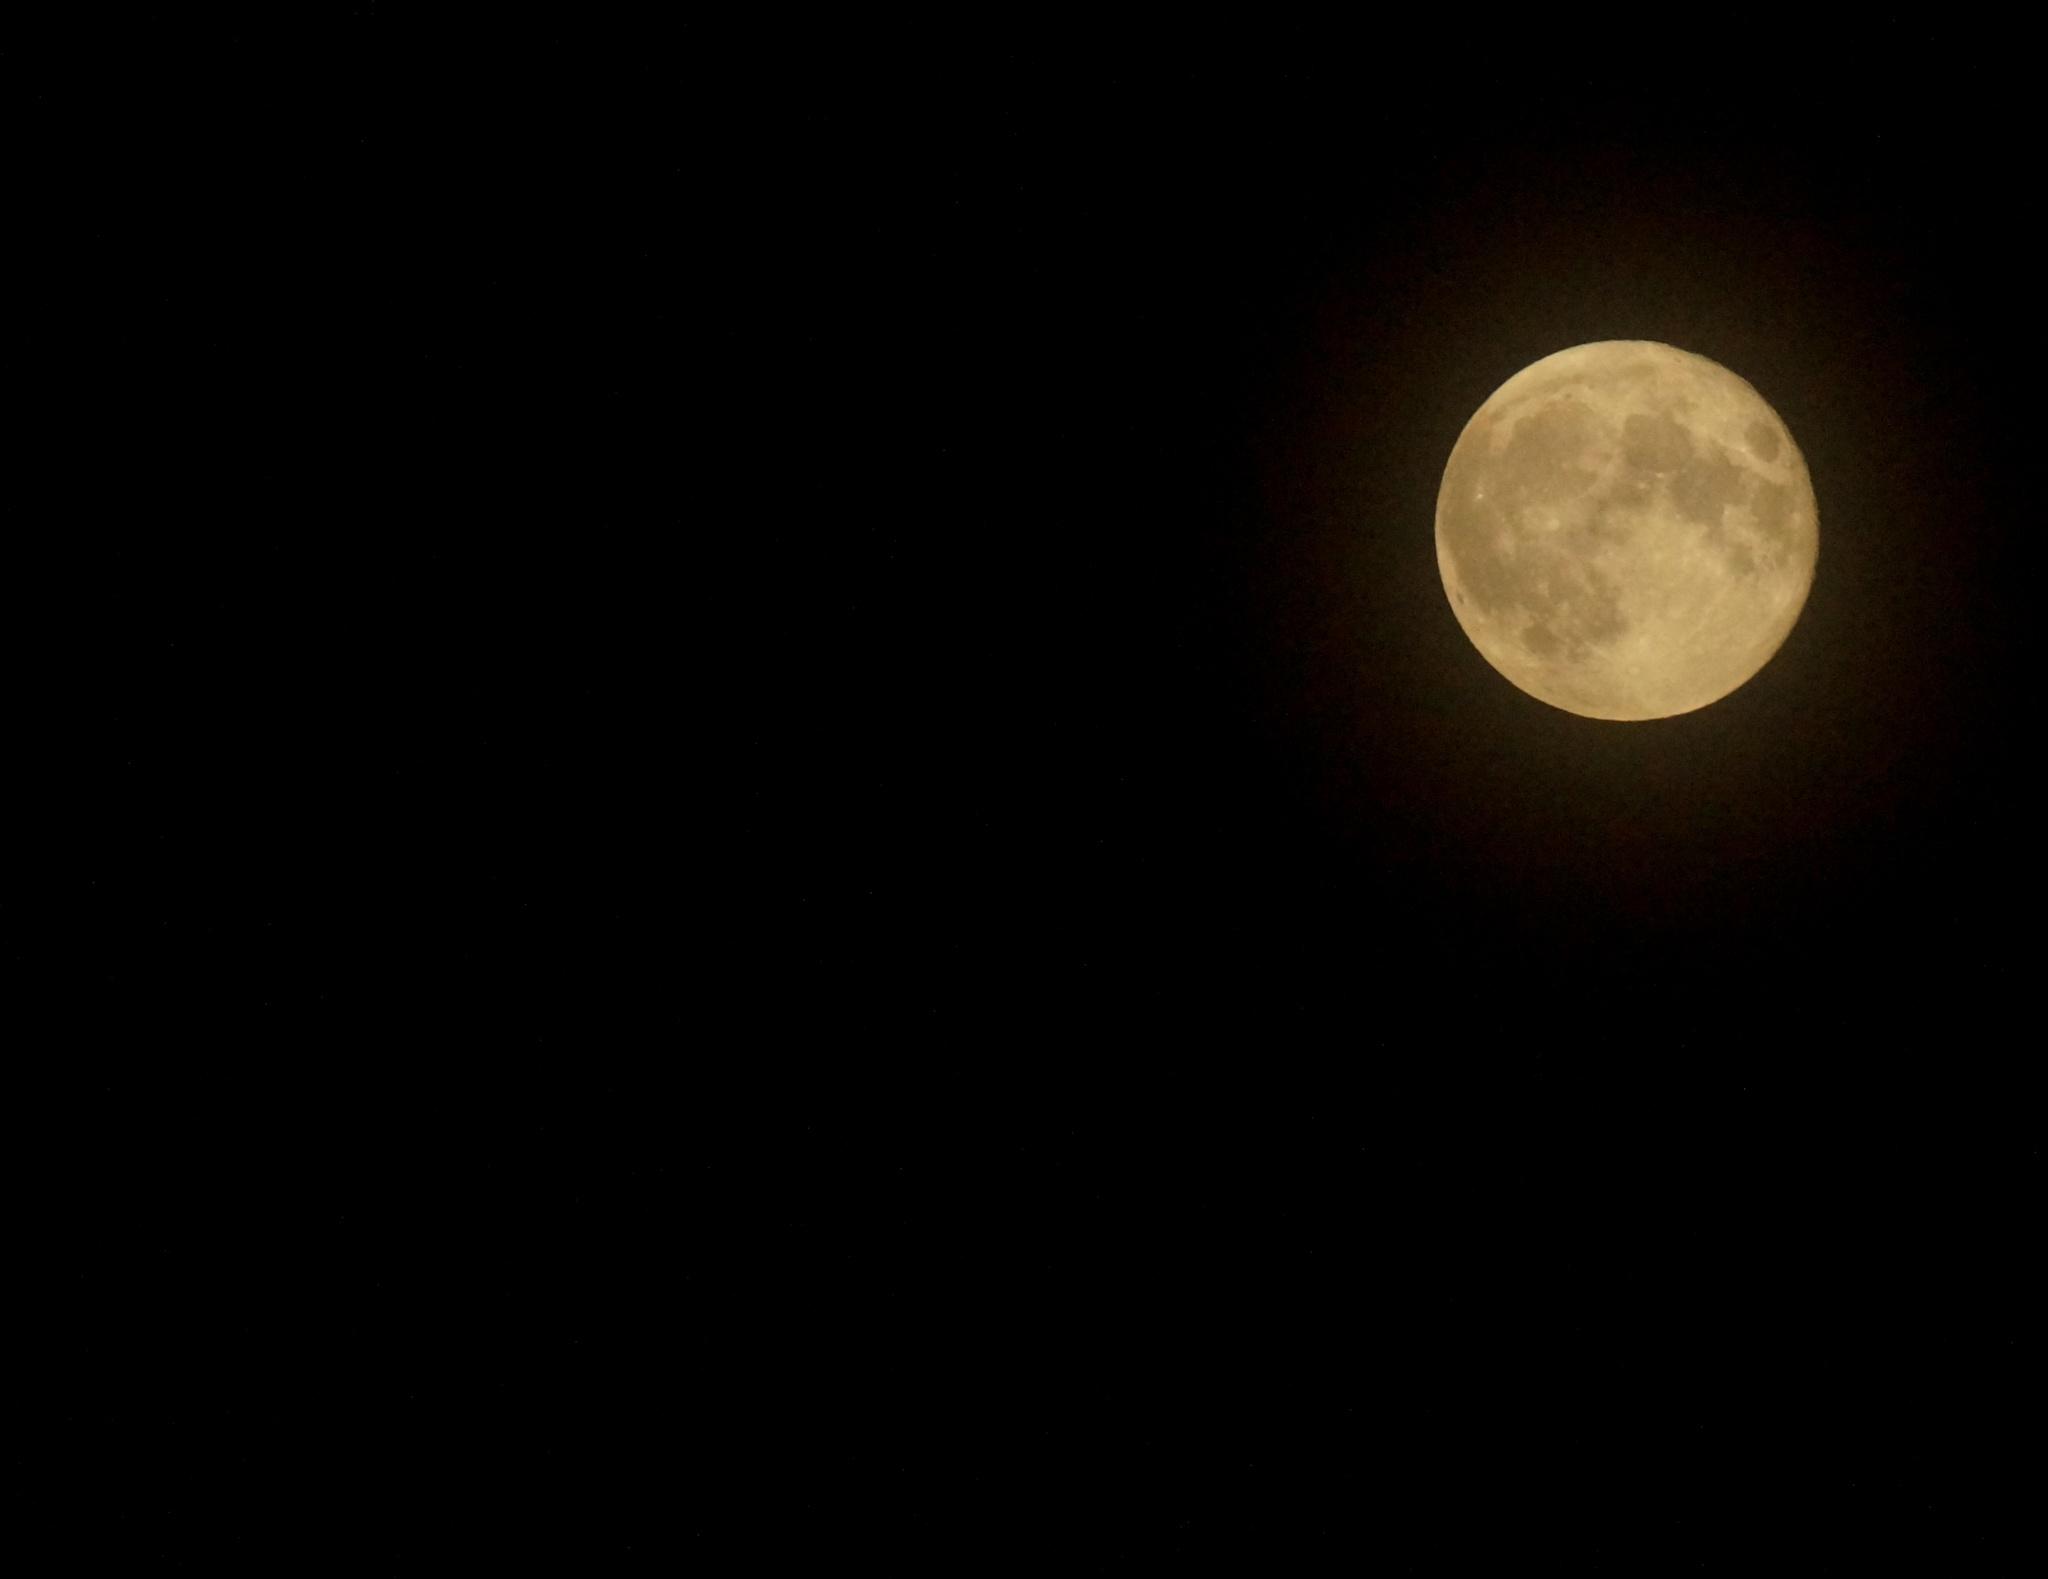 Moon by Brandonc434